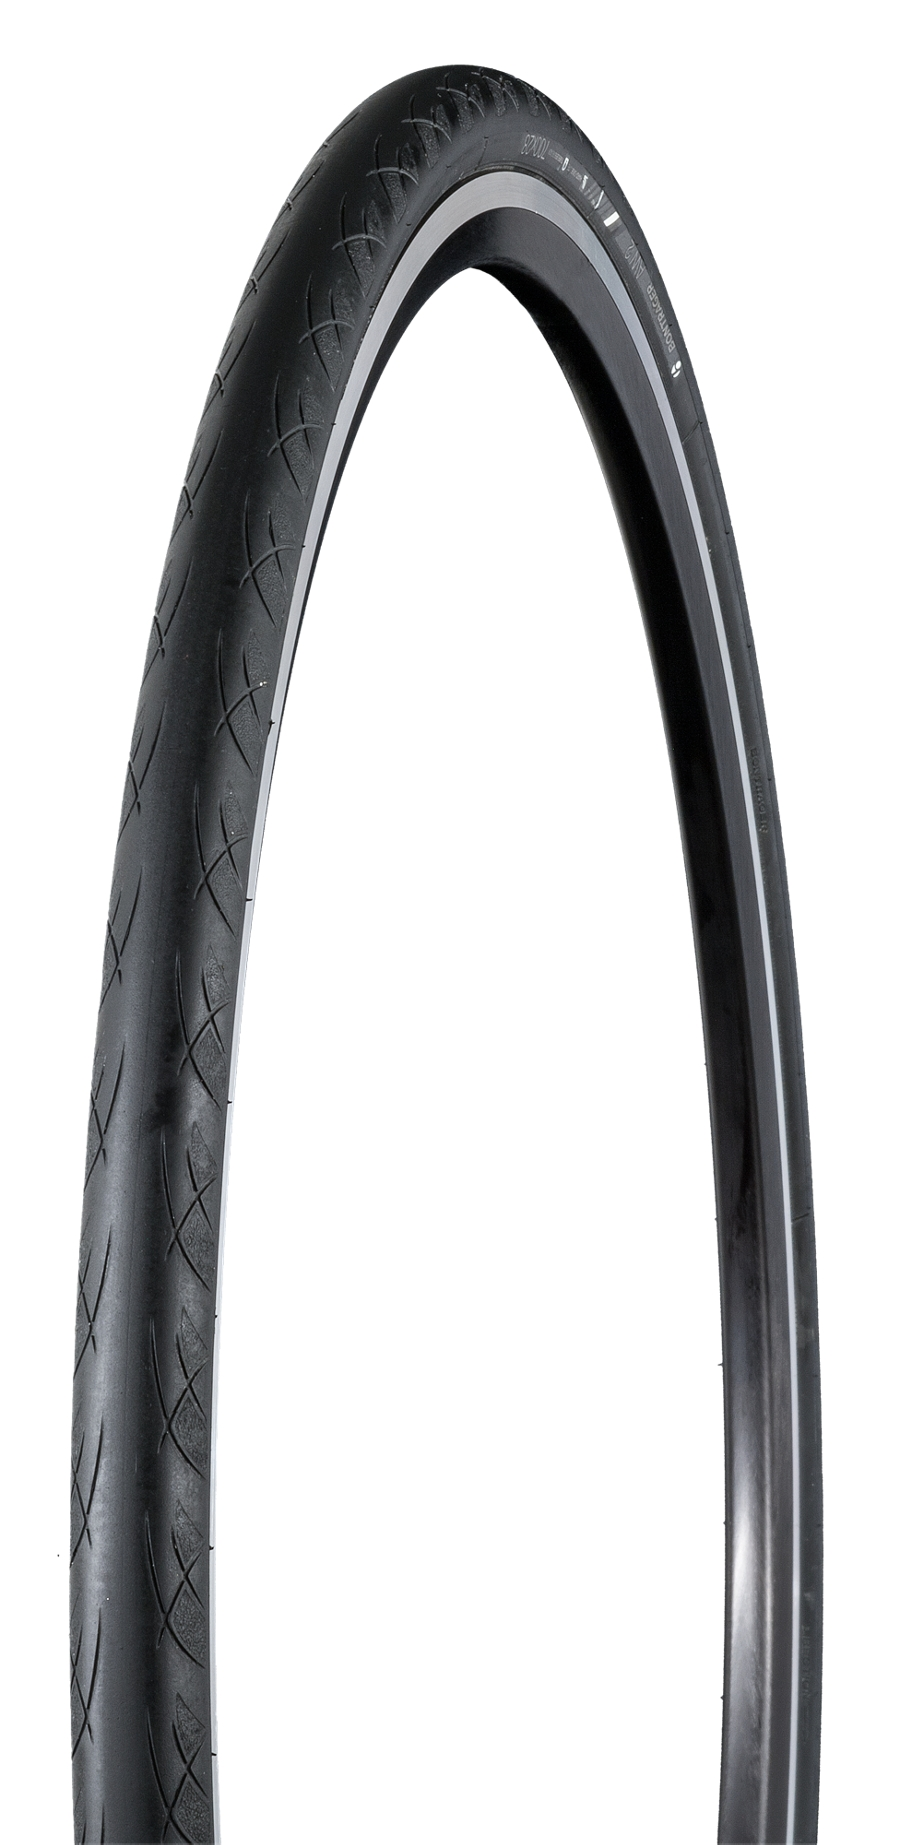 Bontrager Reifen AW2 Hard-Case Lite 700x25C - Bontrager Reifen AW2 Hard-Case Lite 700x25C